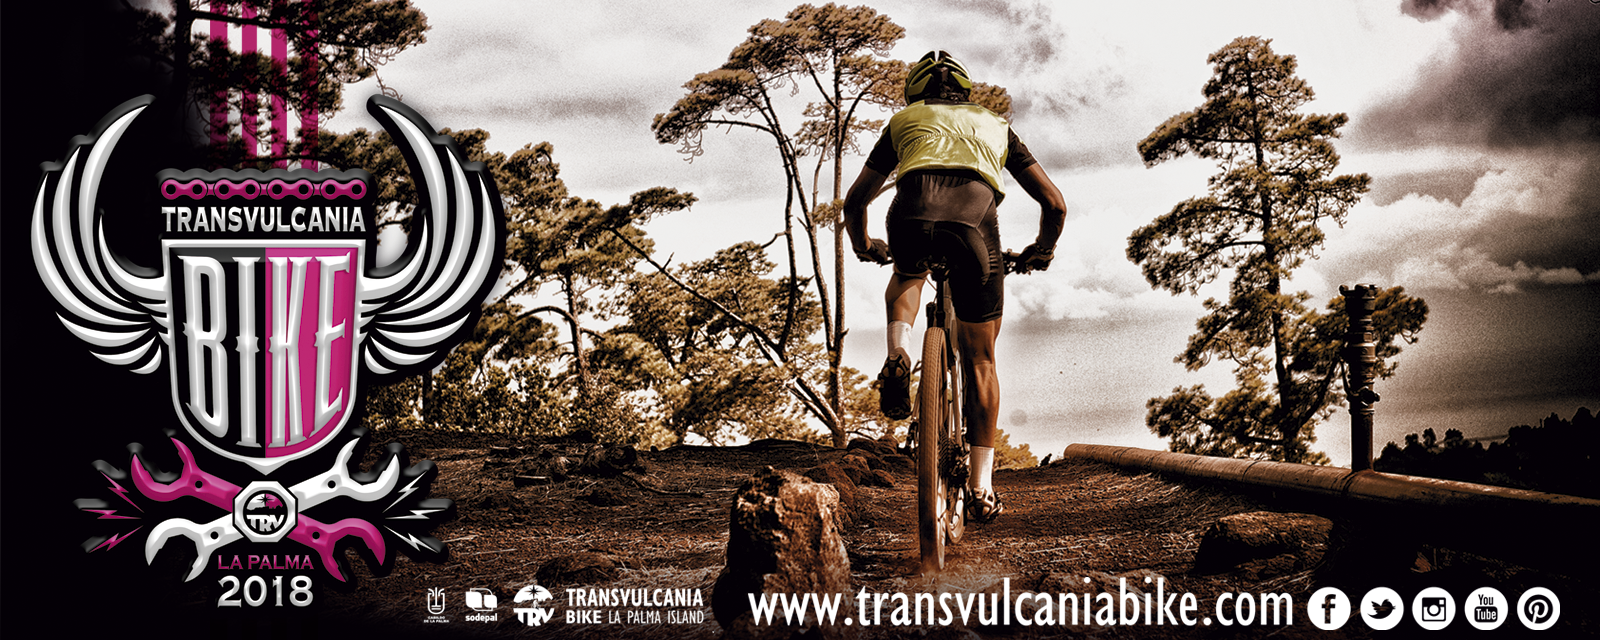 Transvulcania Bike 2018